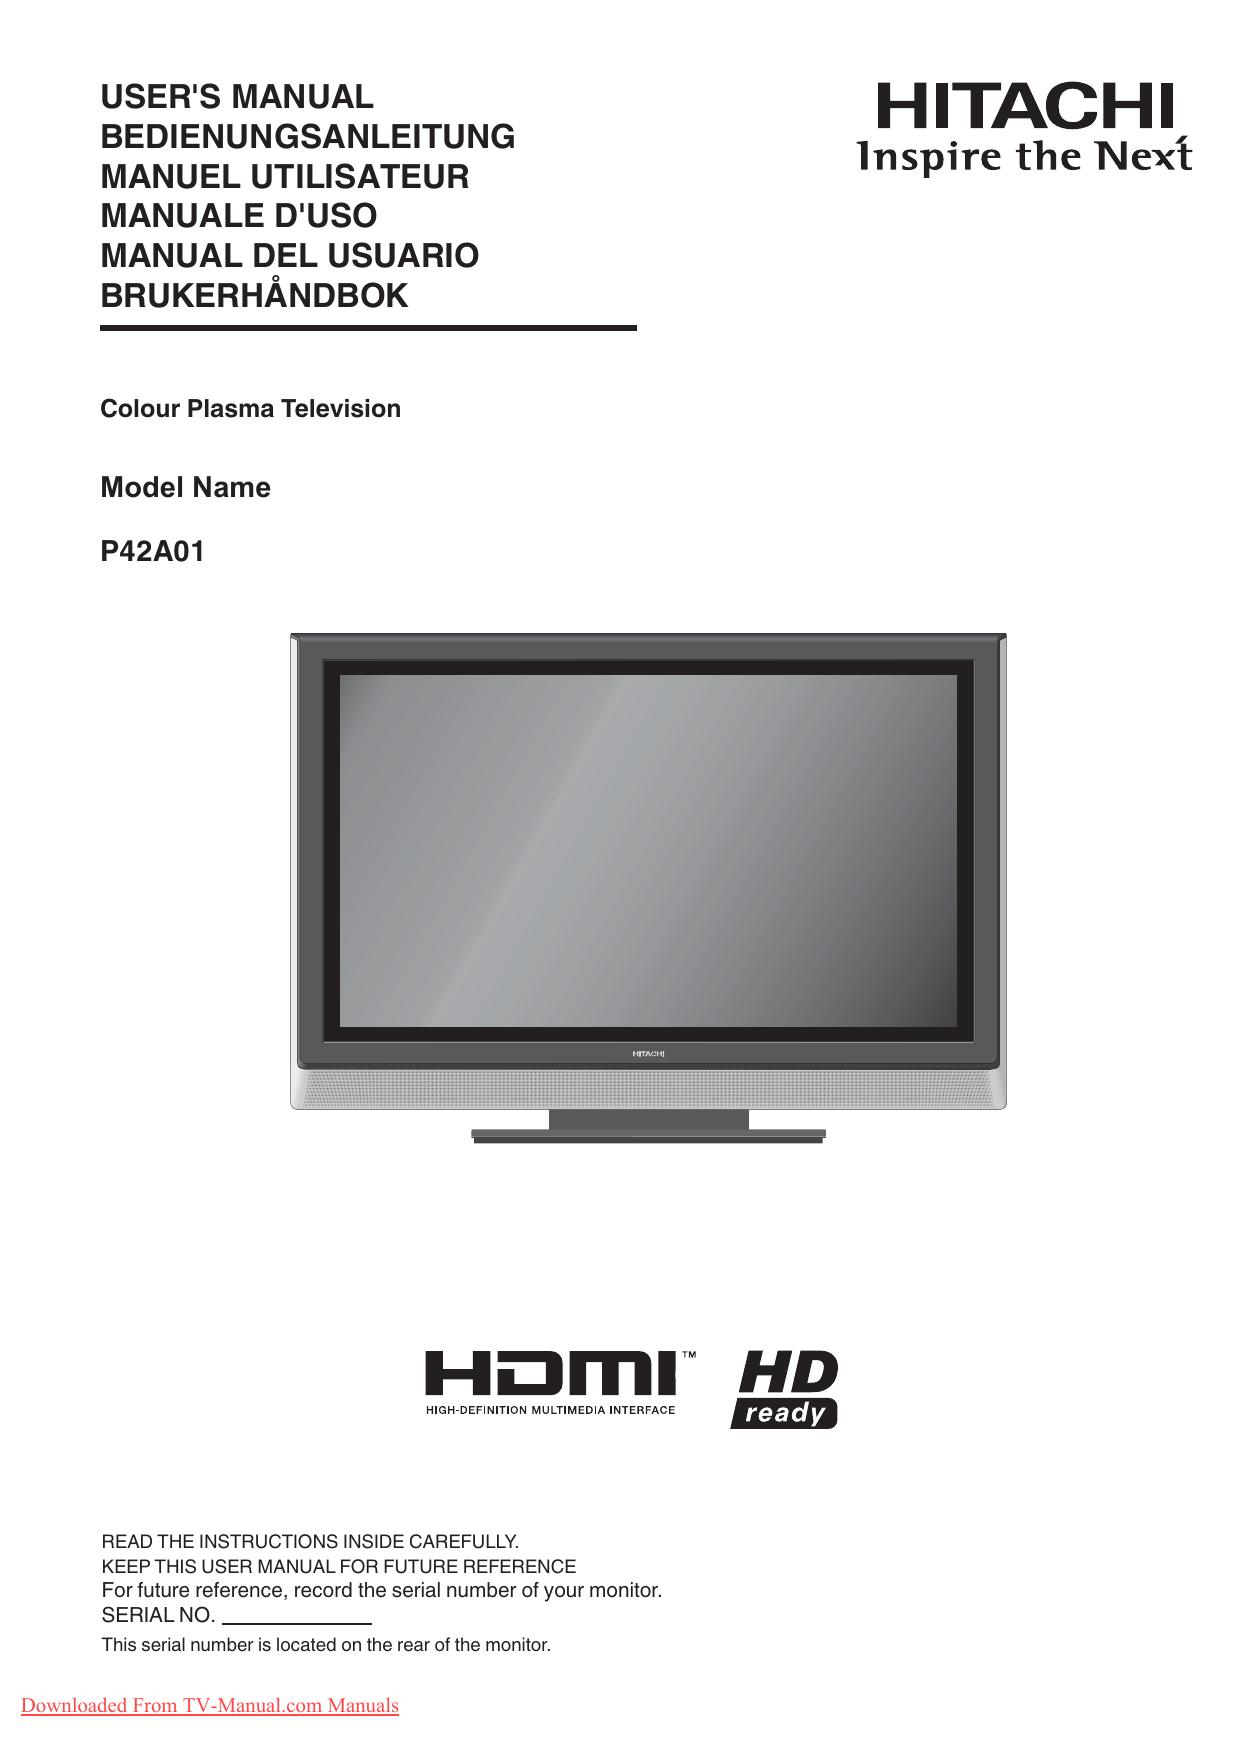 hitachi p42a01a tv user guide manual operating instructions pdf rh manualzz com